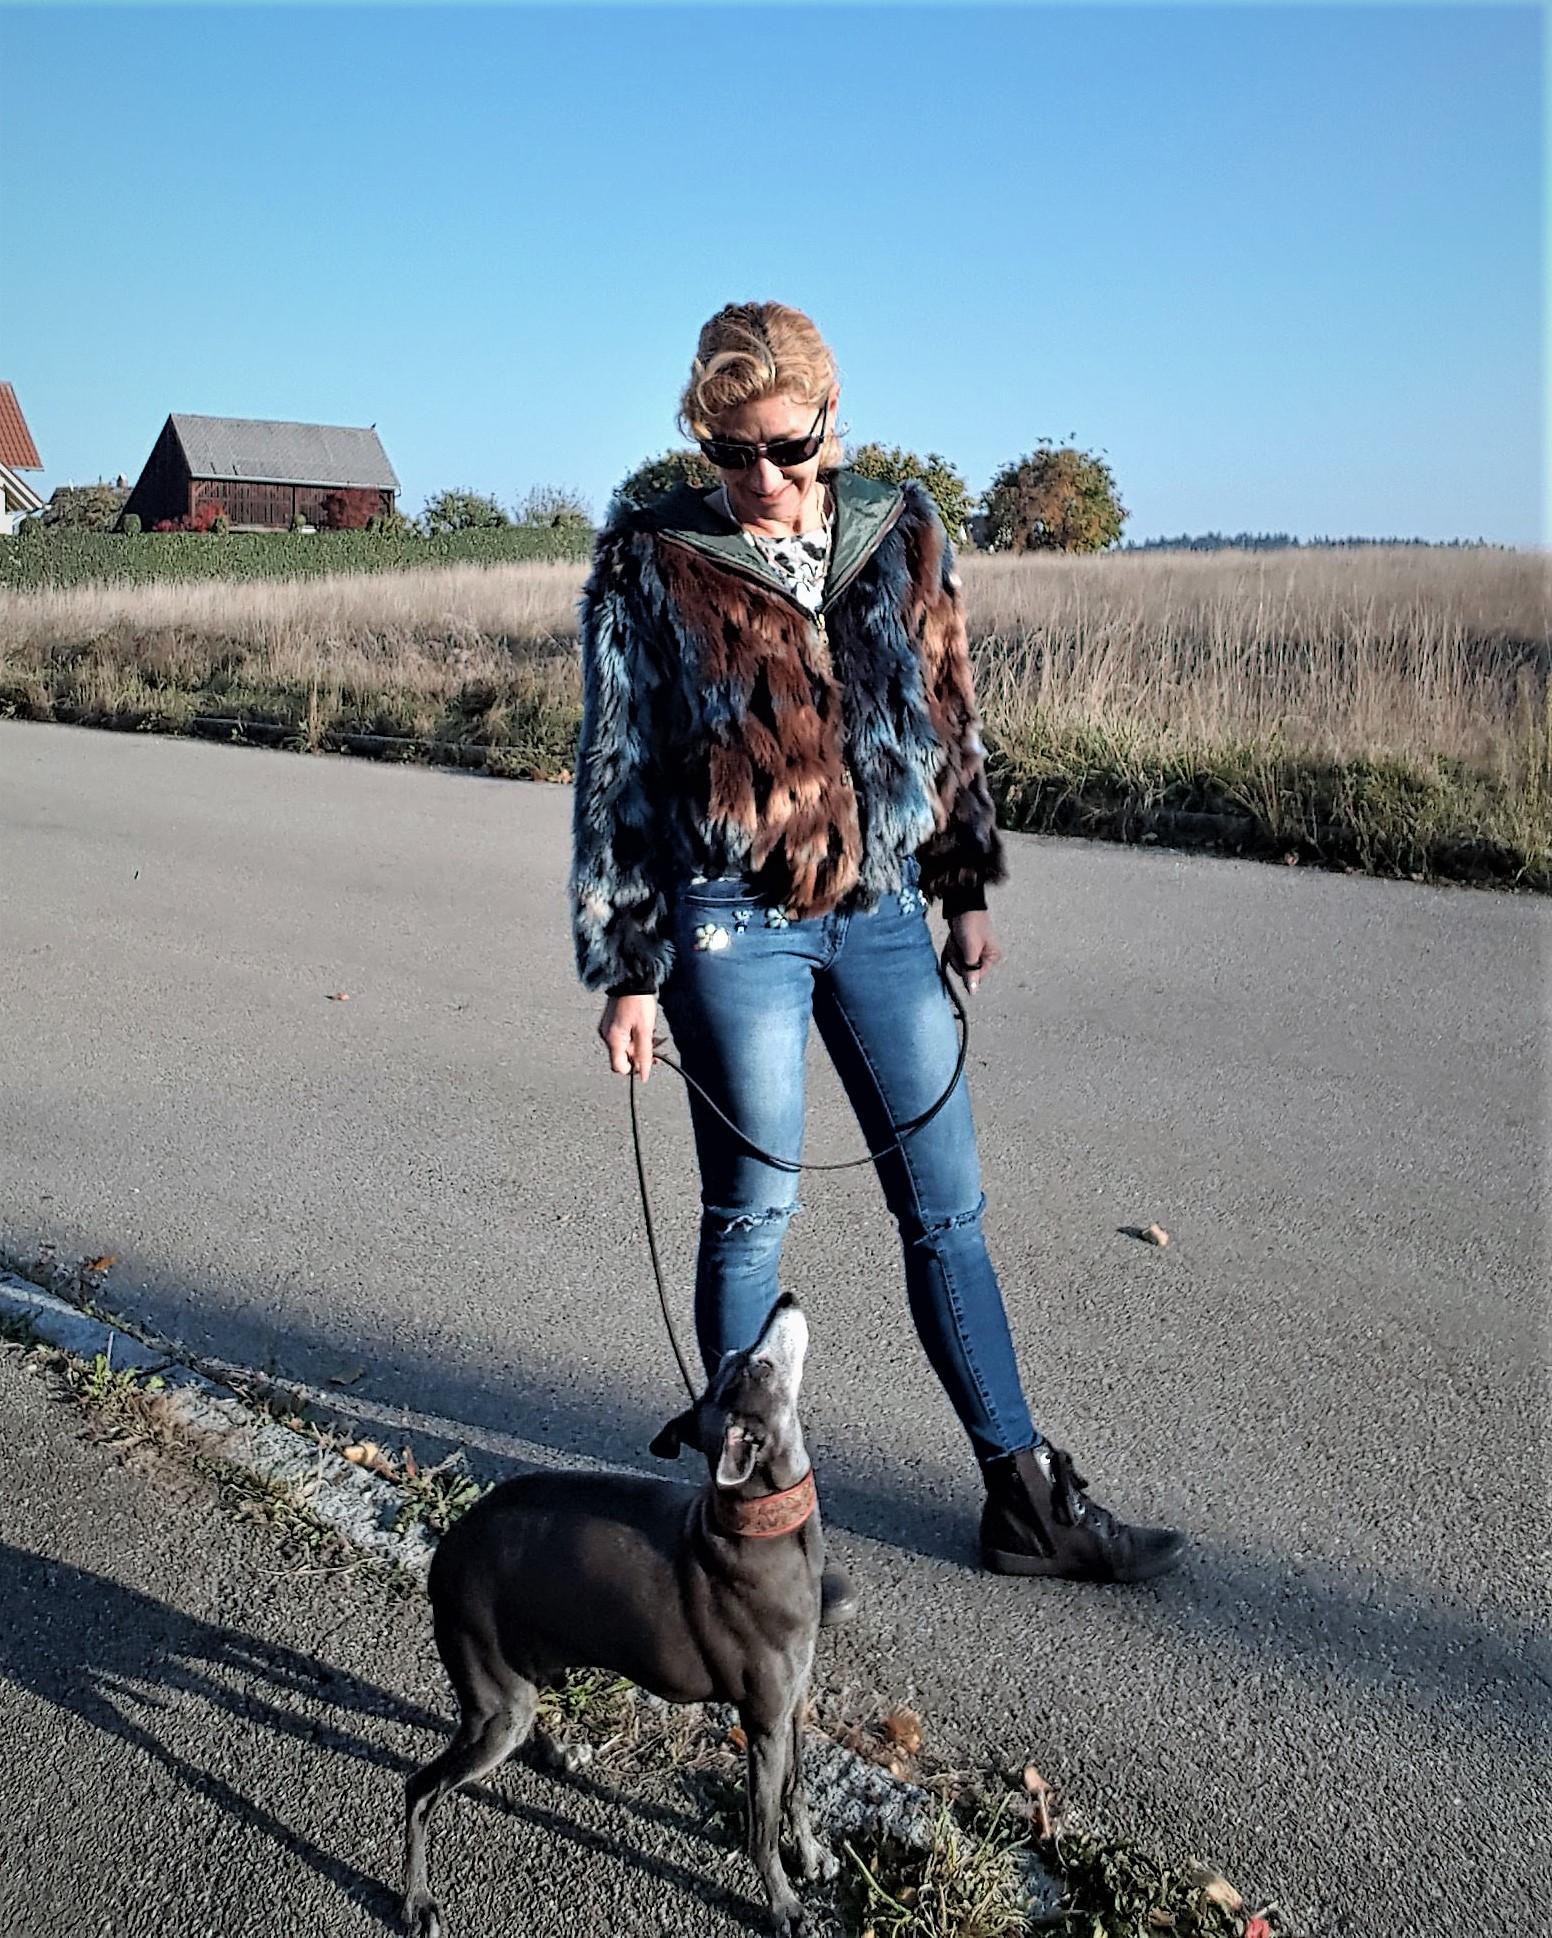 Verlässliche Hunde, gut erzogene Hunde, Rücksichtnahme bei Hunden